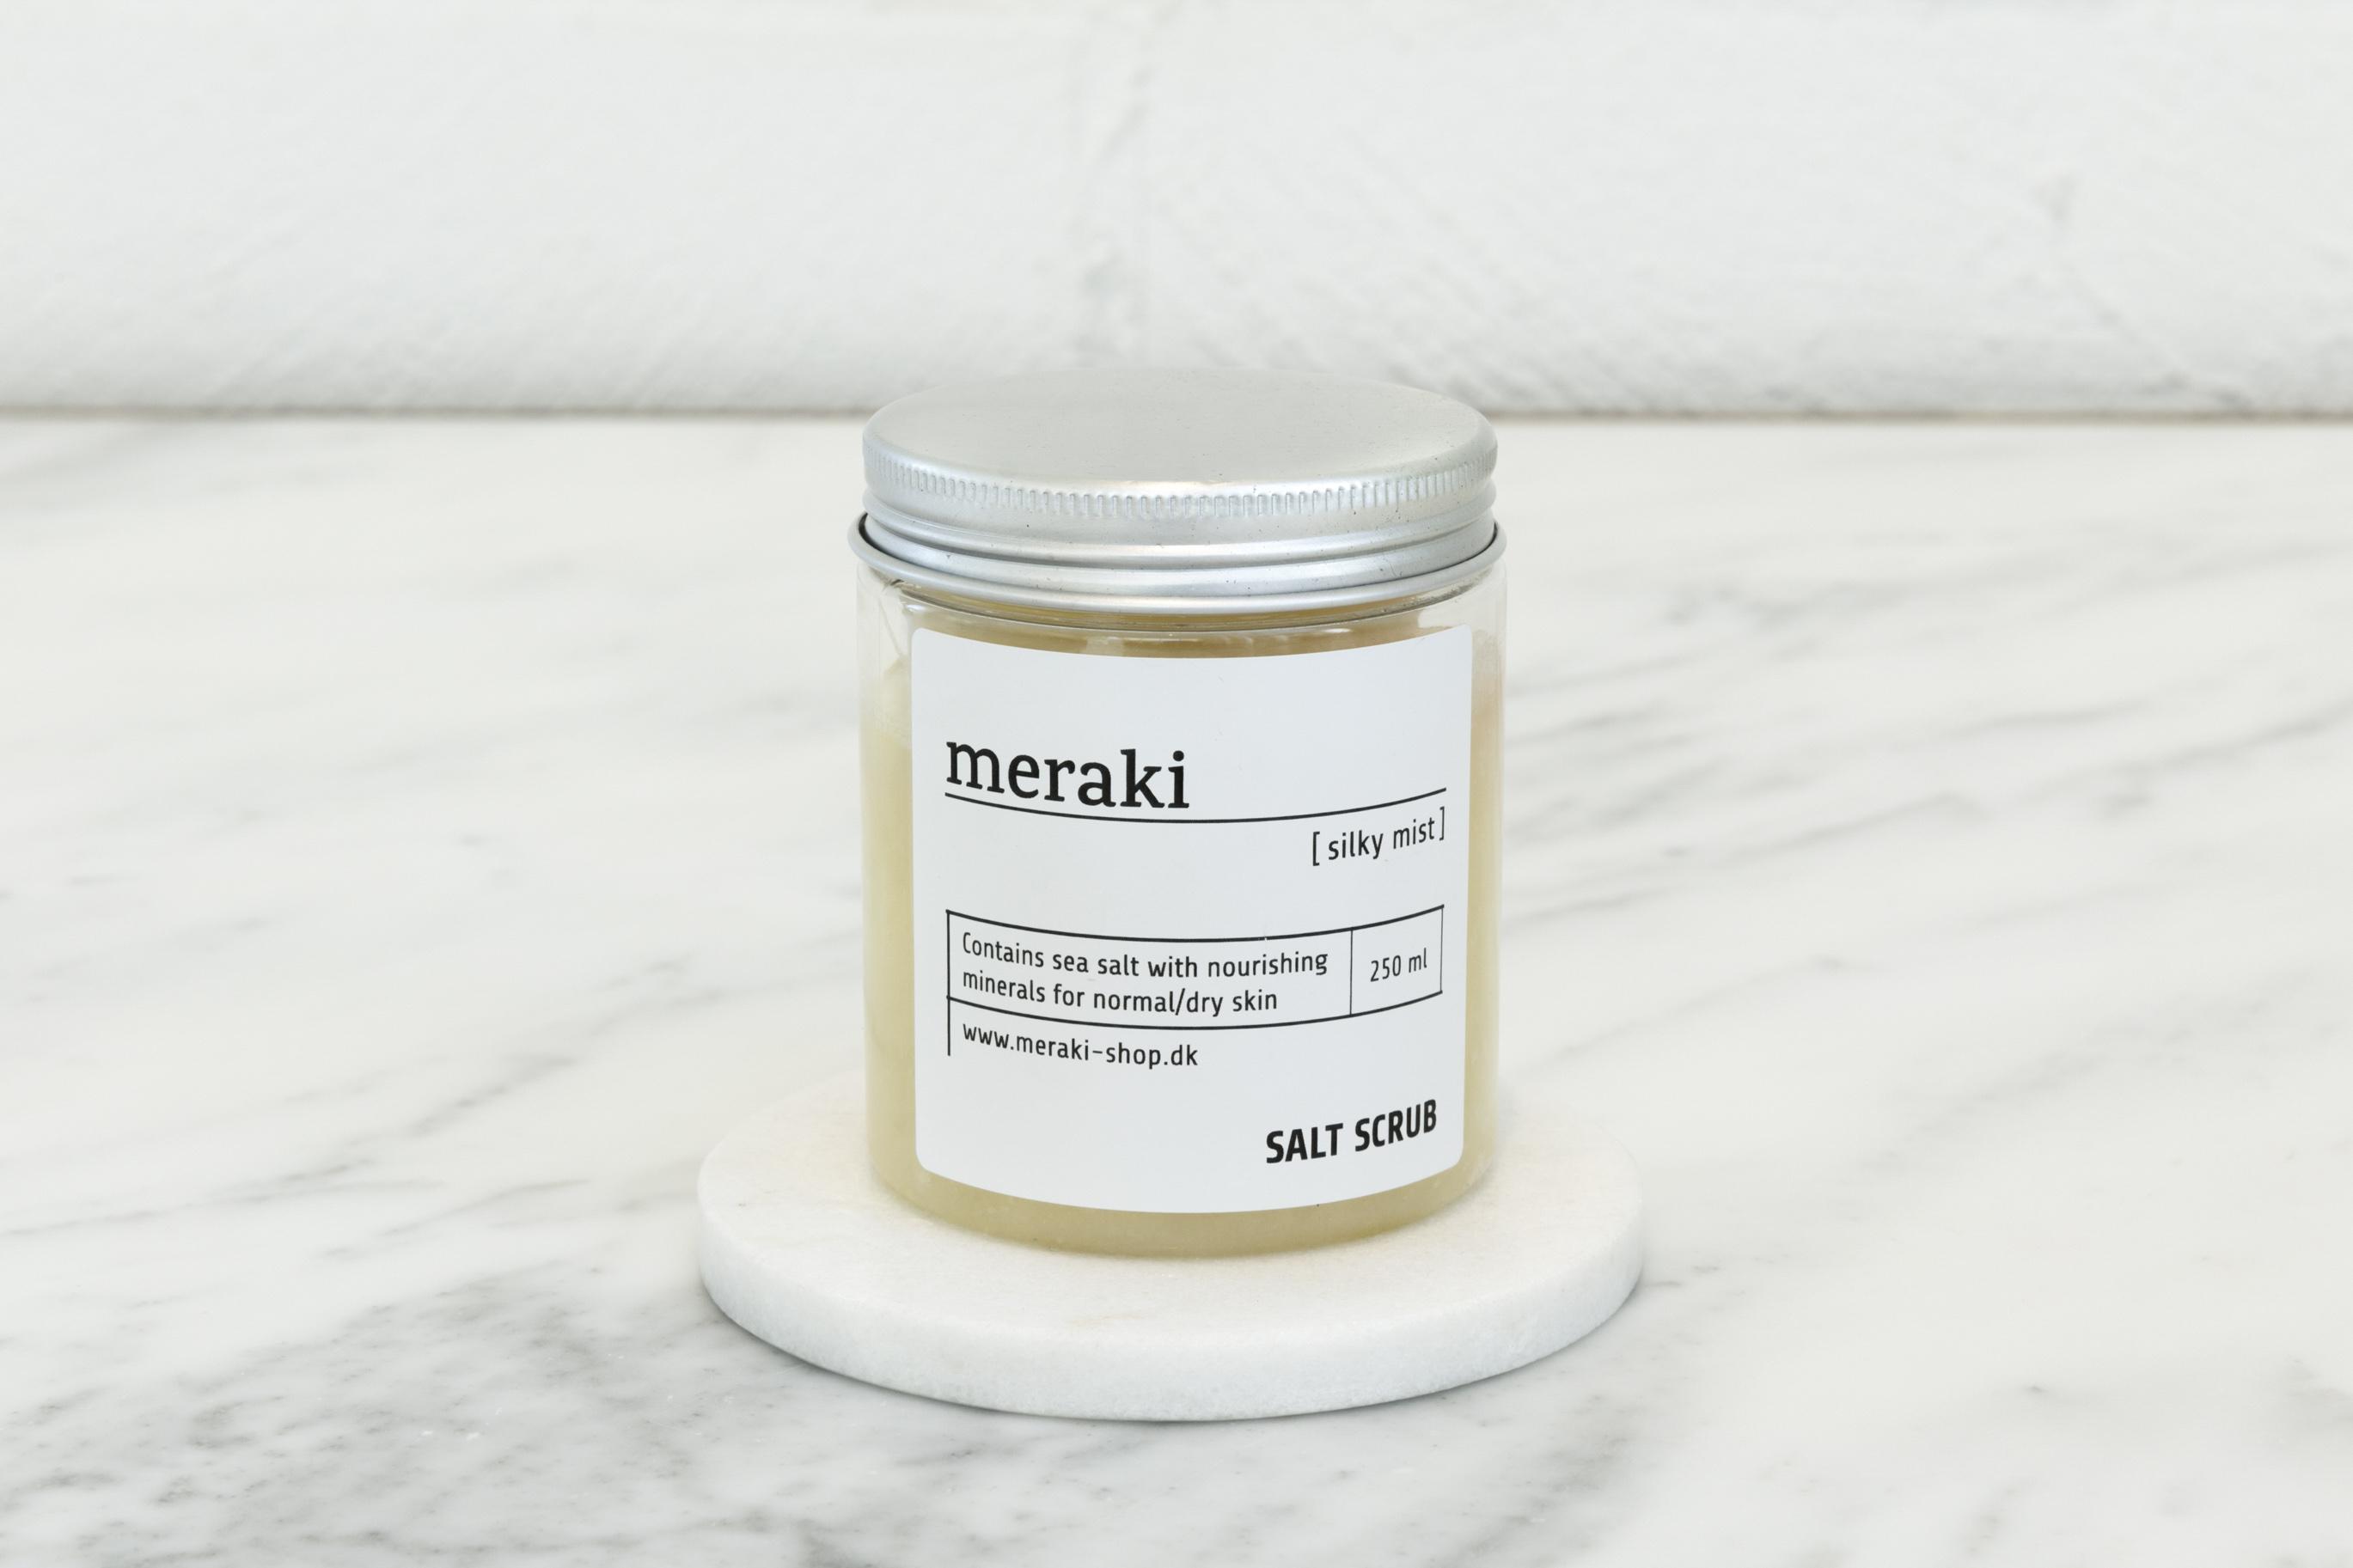 blush-meraki-salt-scrub